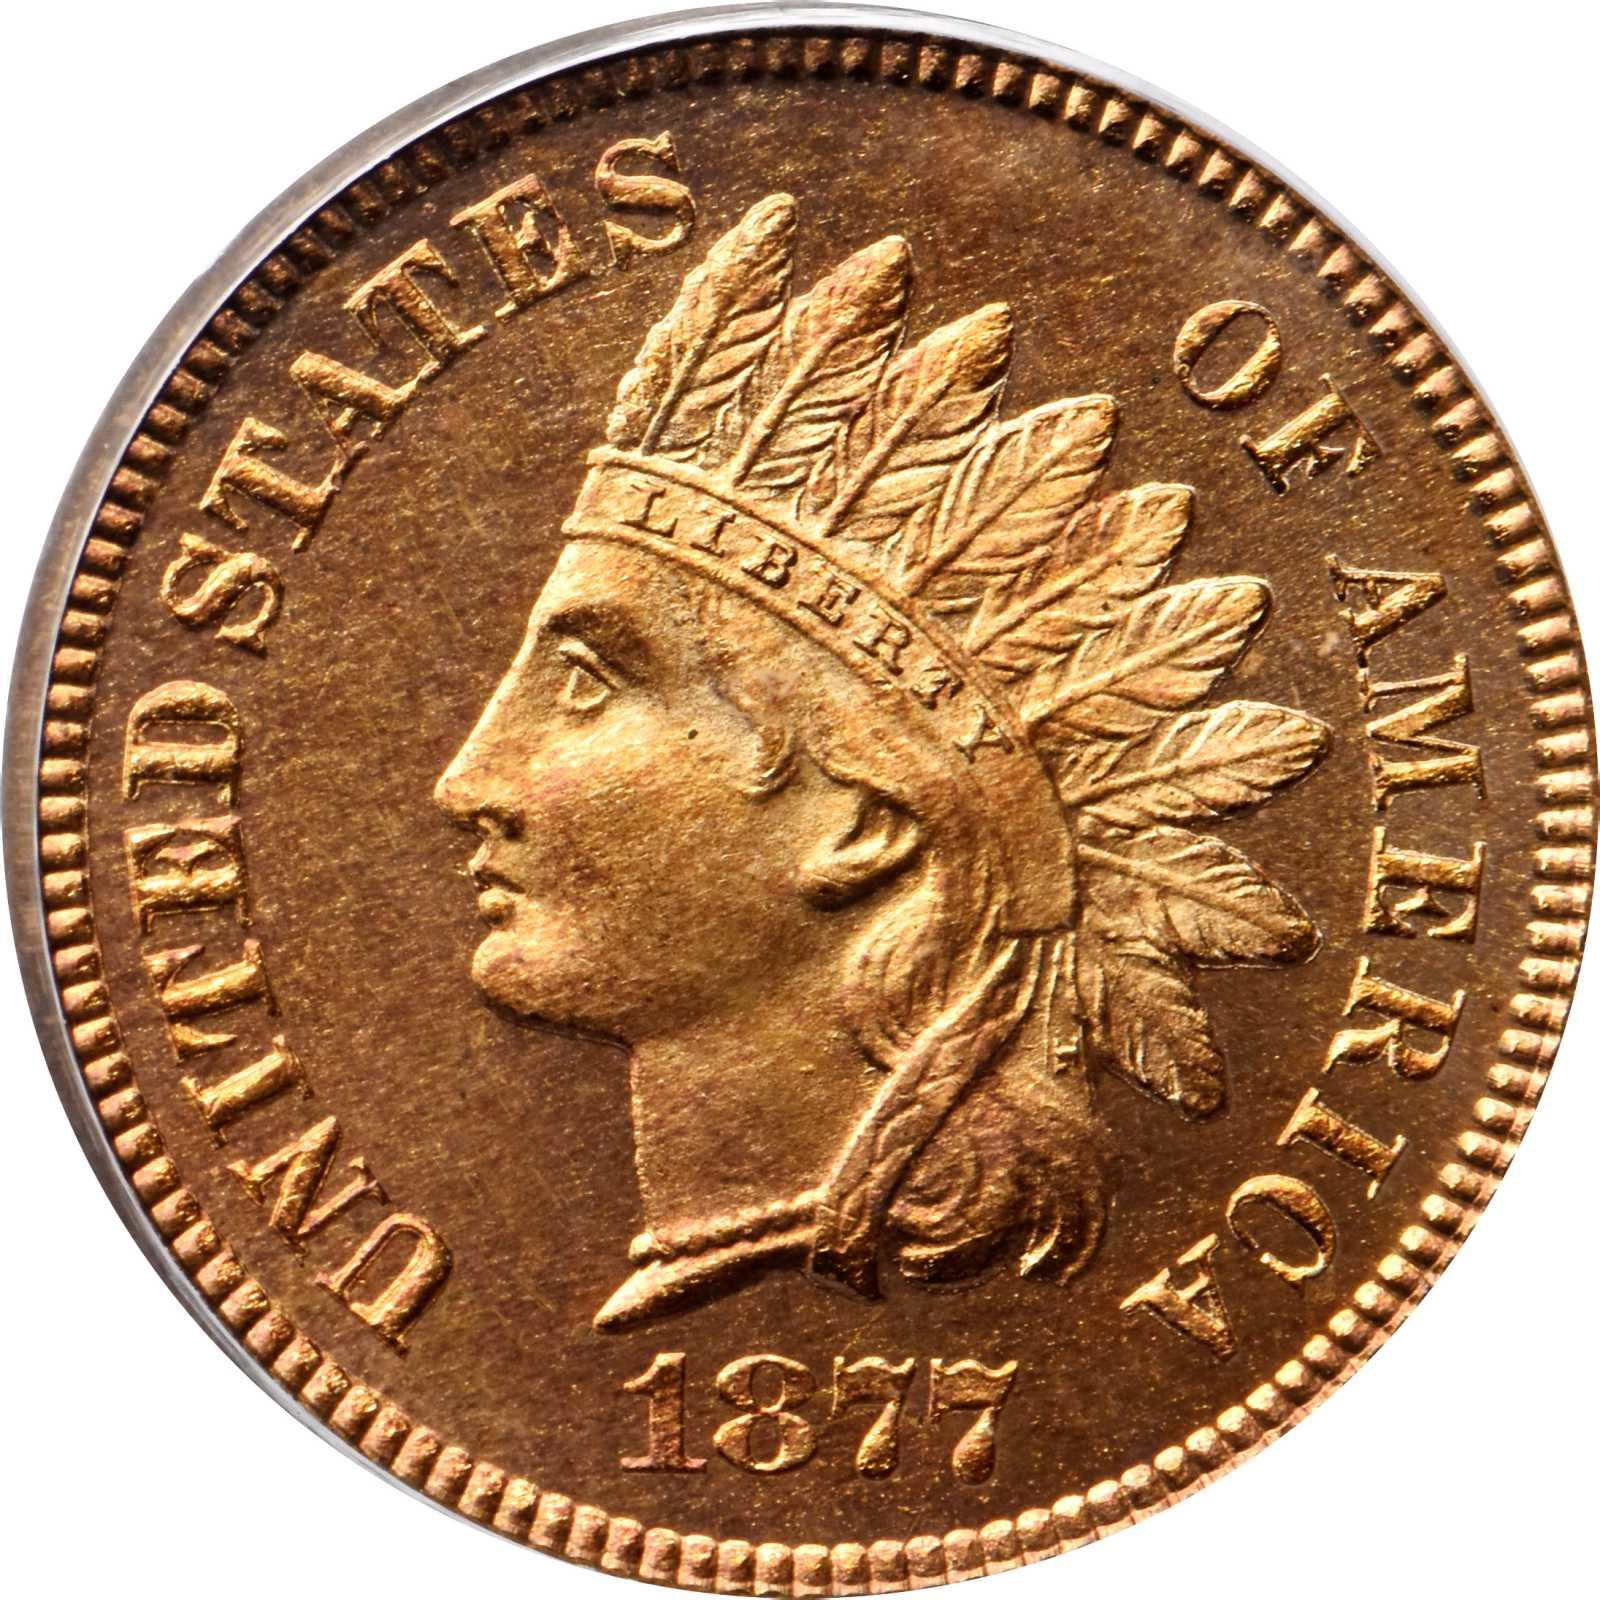 Gem Proof 1877 Indian Cent